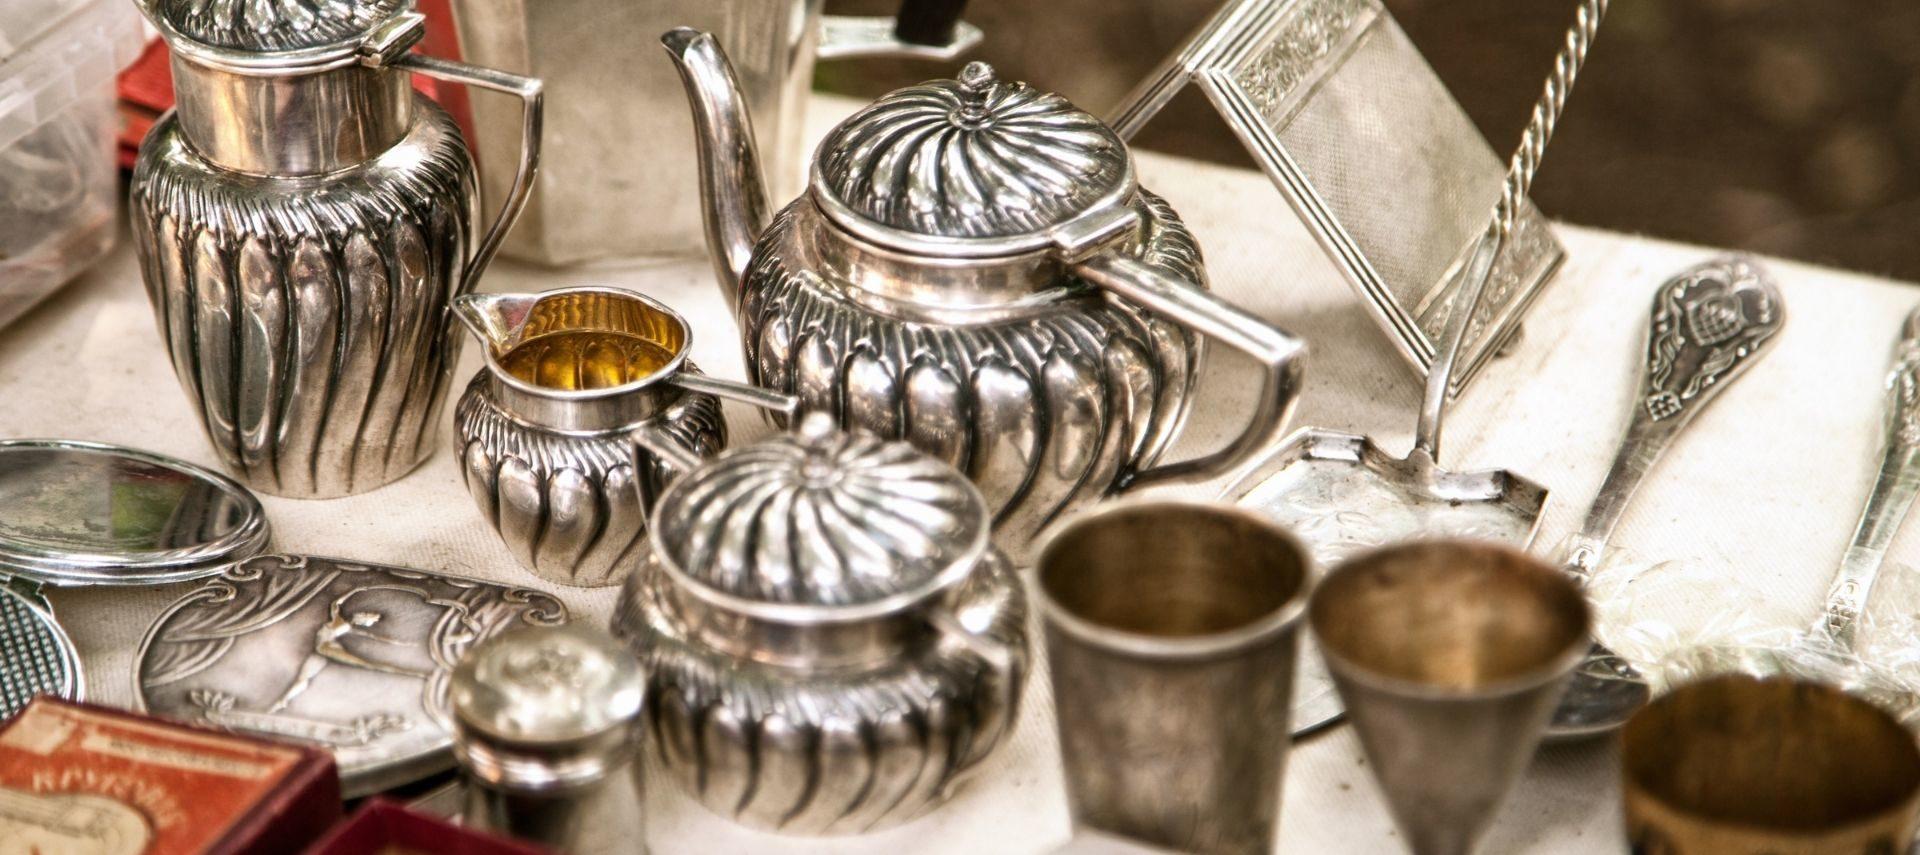 Antique silver, tea pots, cups on a table